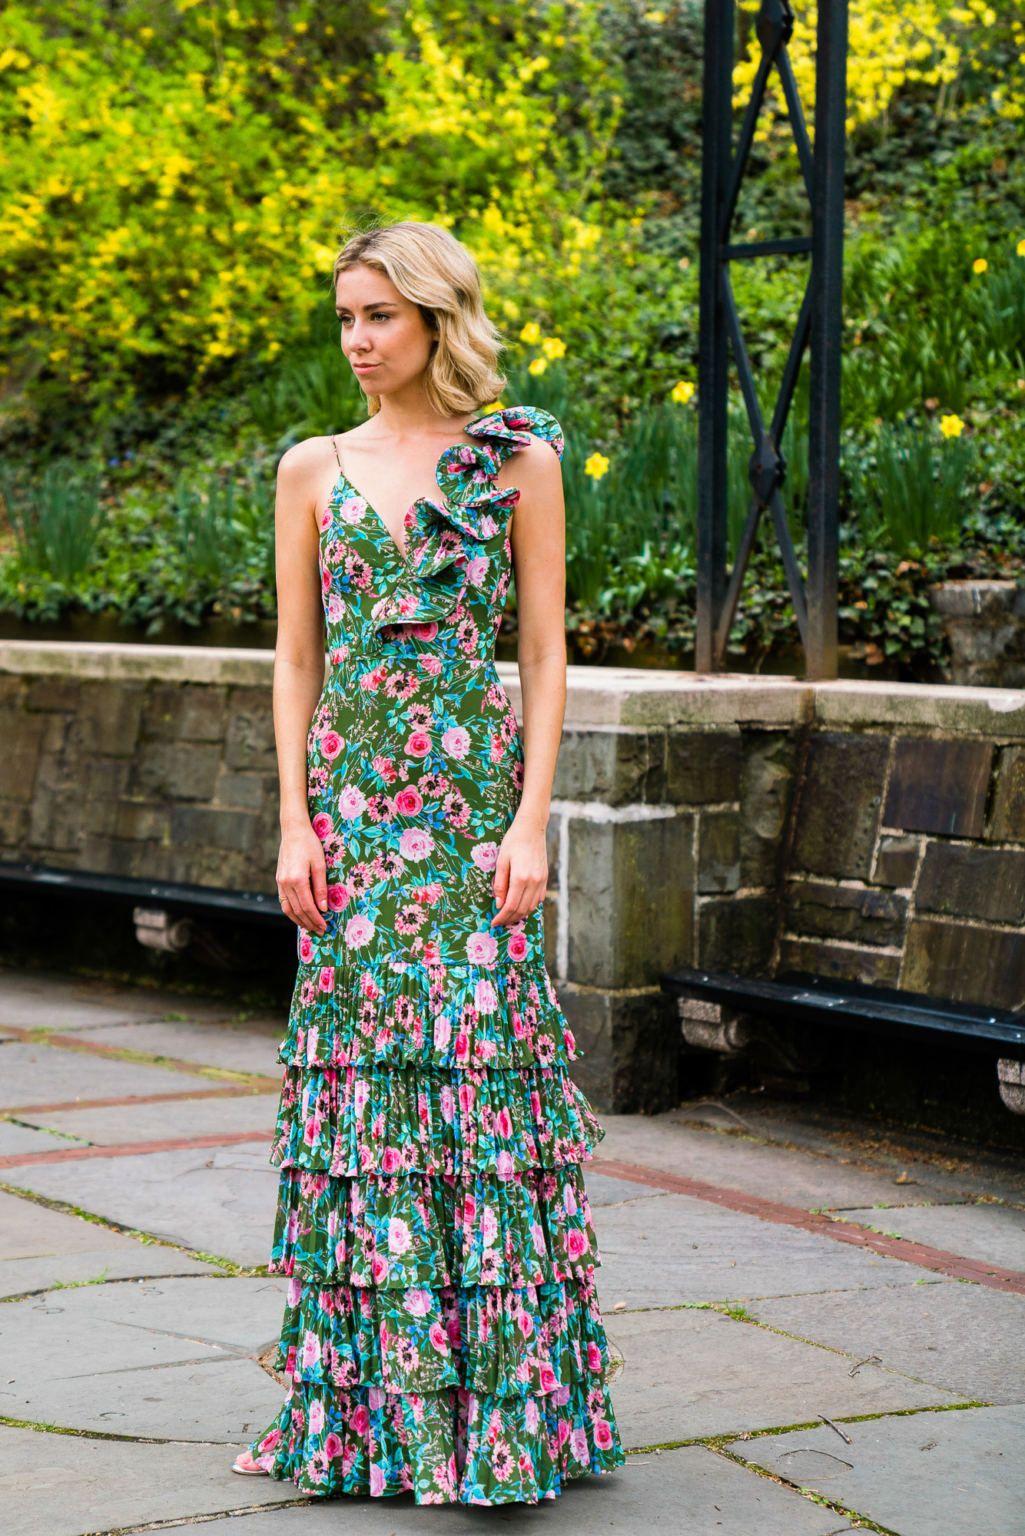 14 Most Classy Wedding Guest Dresses Ever Vera Casagrande Classy Wedding Guest Dresses Dresses To Wear To A Wedding Summer Formal Dresses [ 1536 x 1025 Pixel ]